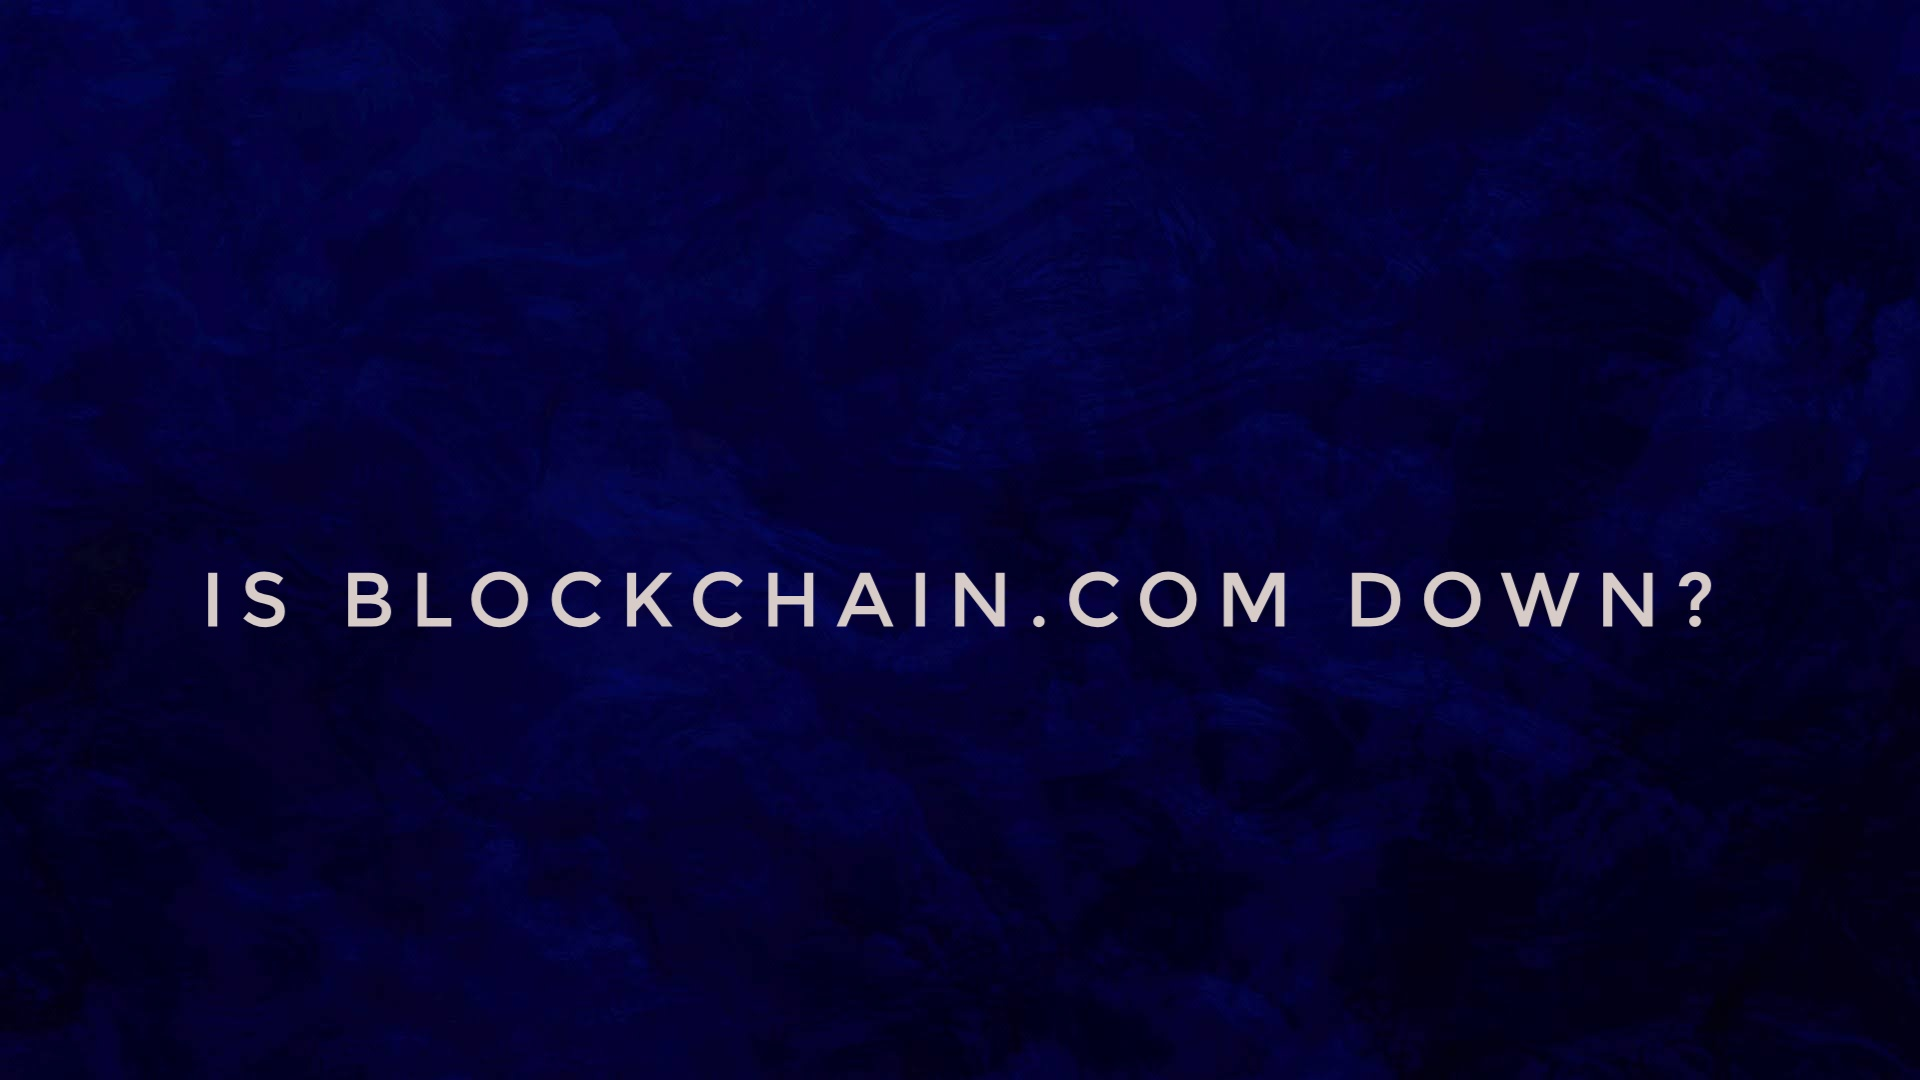 Blockchain.com down